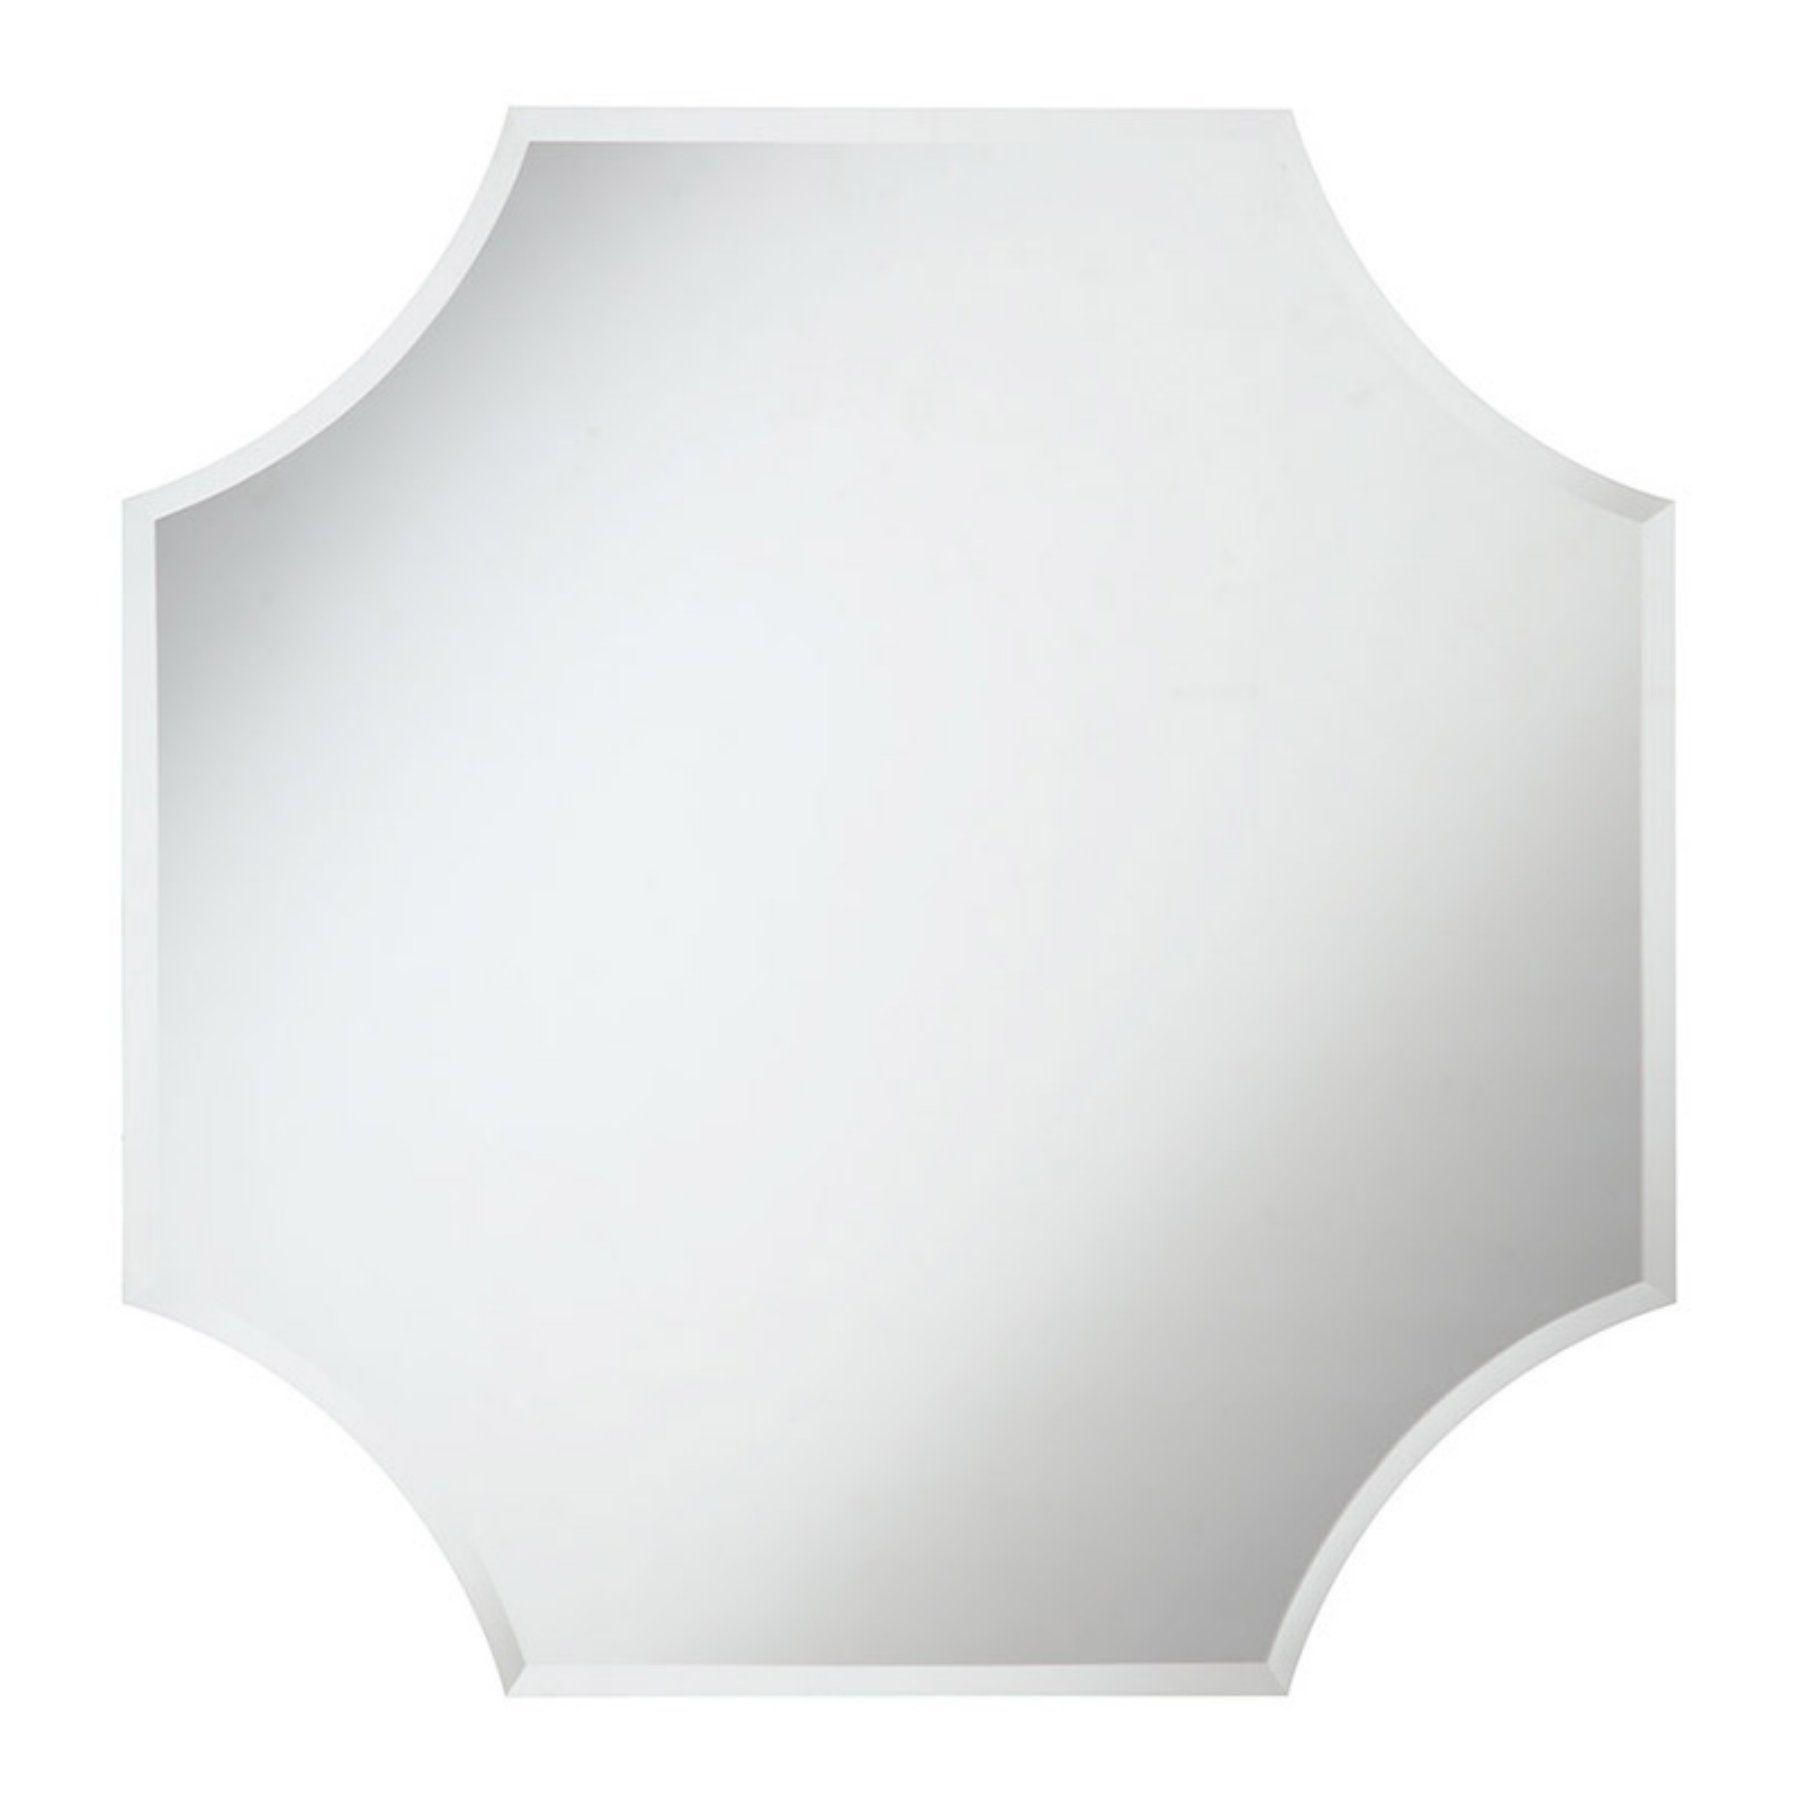 Elegant Furniture & Lighting Metropolitan Wall Mirror - 32W x 32H in. - MR-4014